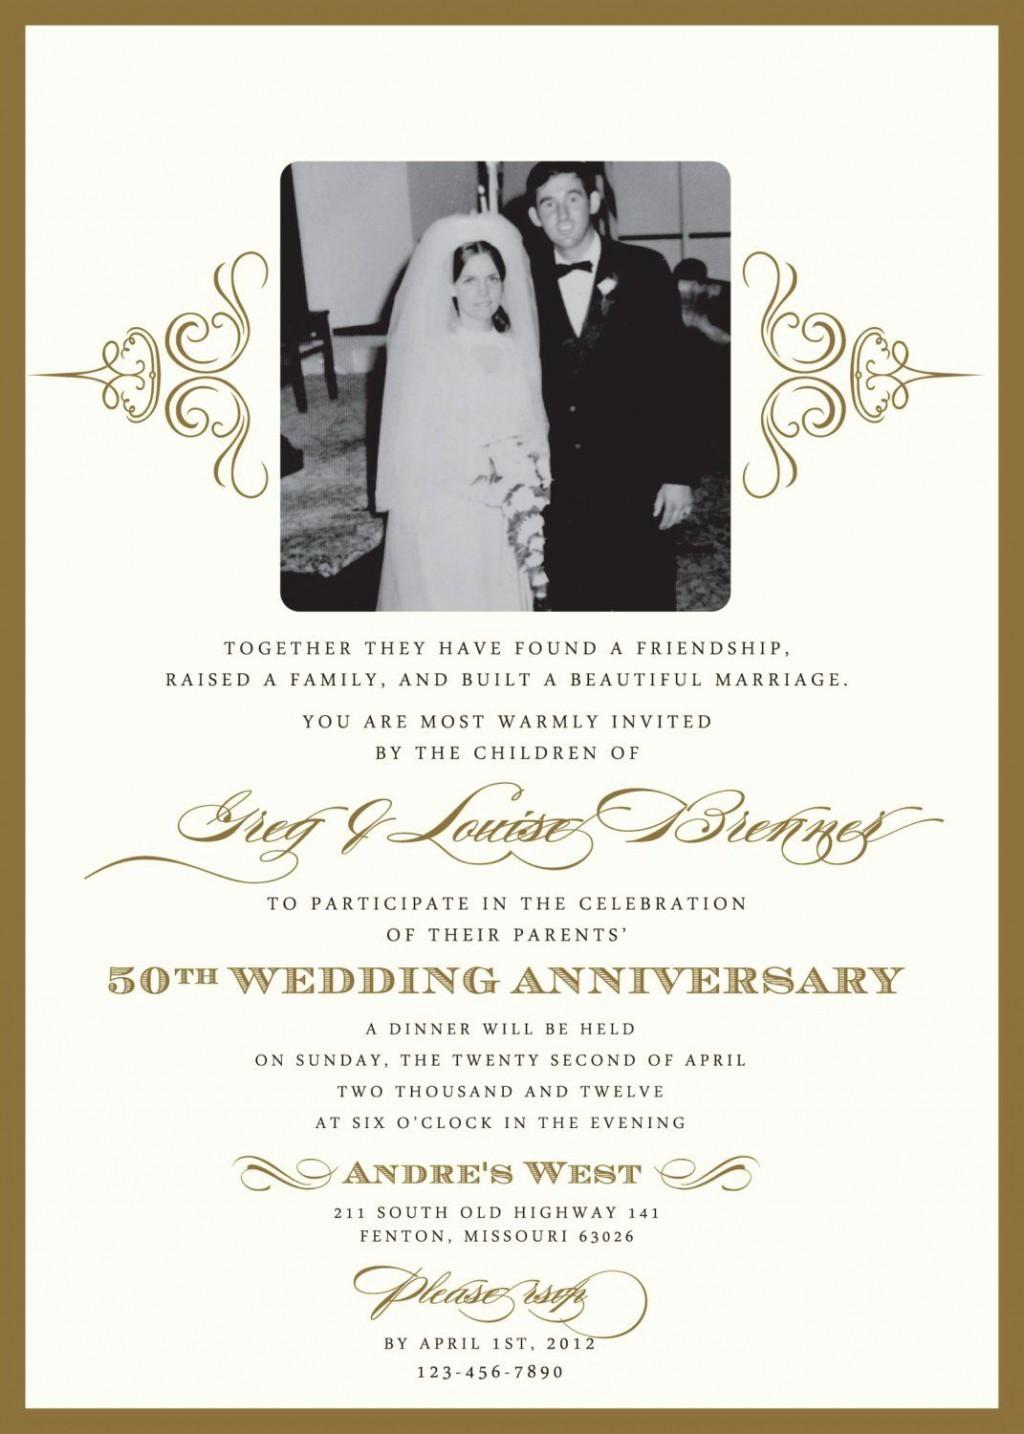 003 Striking Golden Wedding Anniversary Invitation Template Free Highest Clarity  50th Microsoft Word DownloadLarge